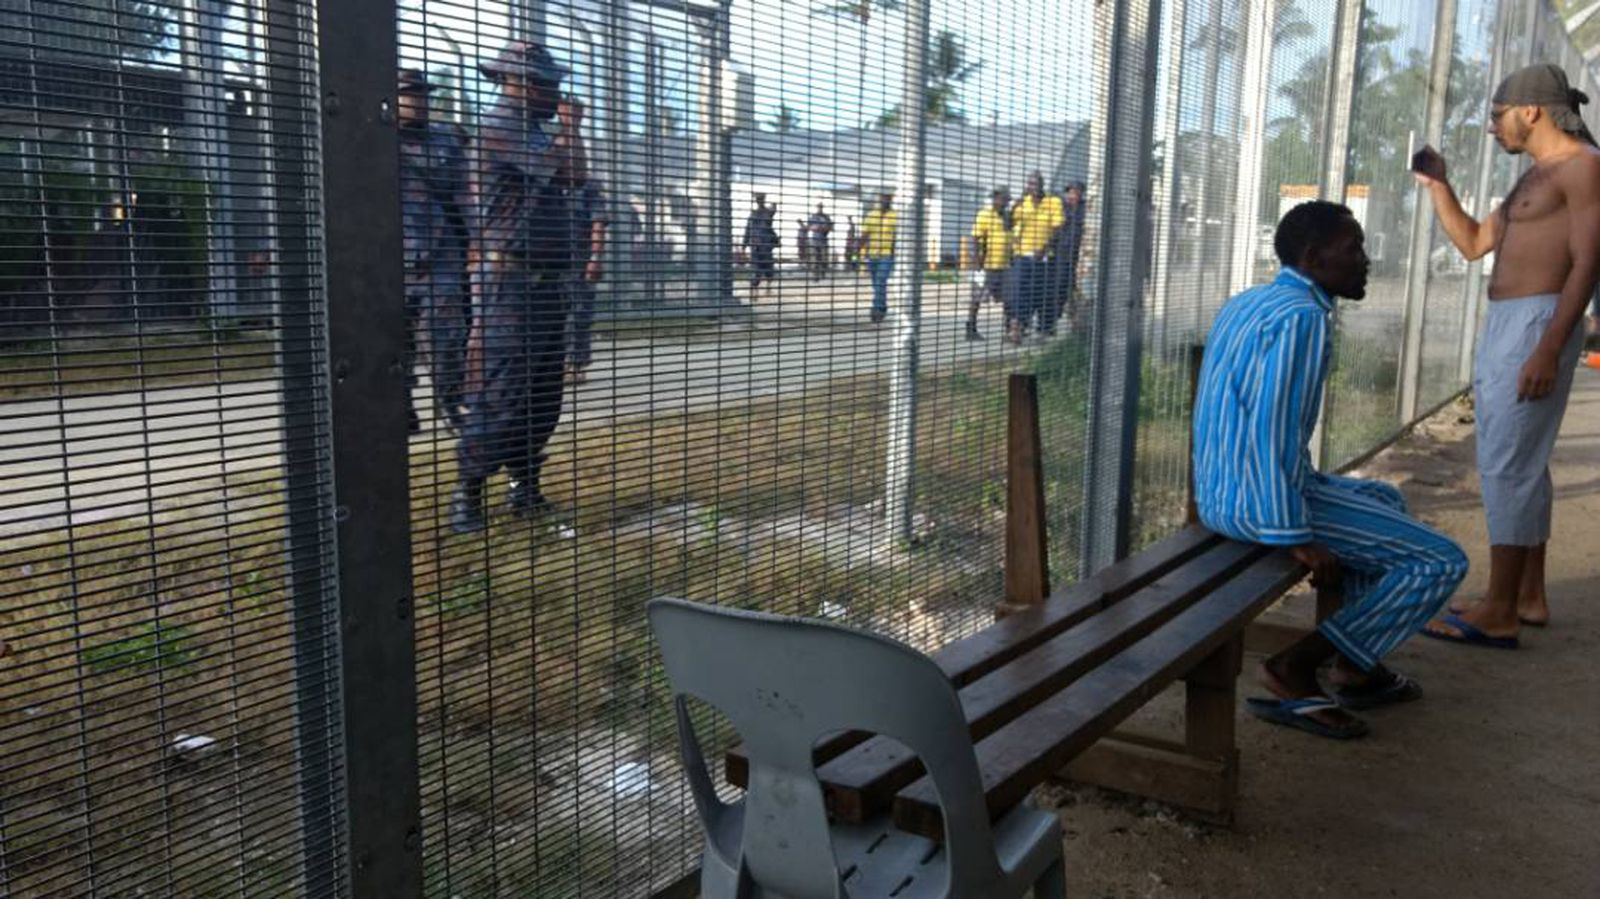 Manus: Polizei räumt aufgelöstes Flüchtlingslager